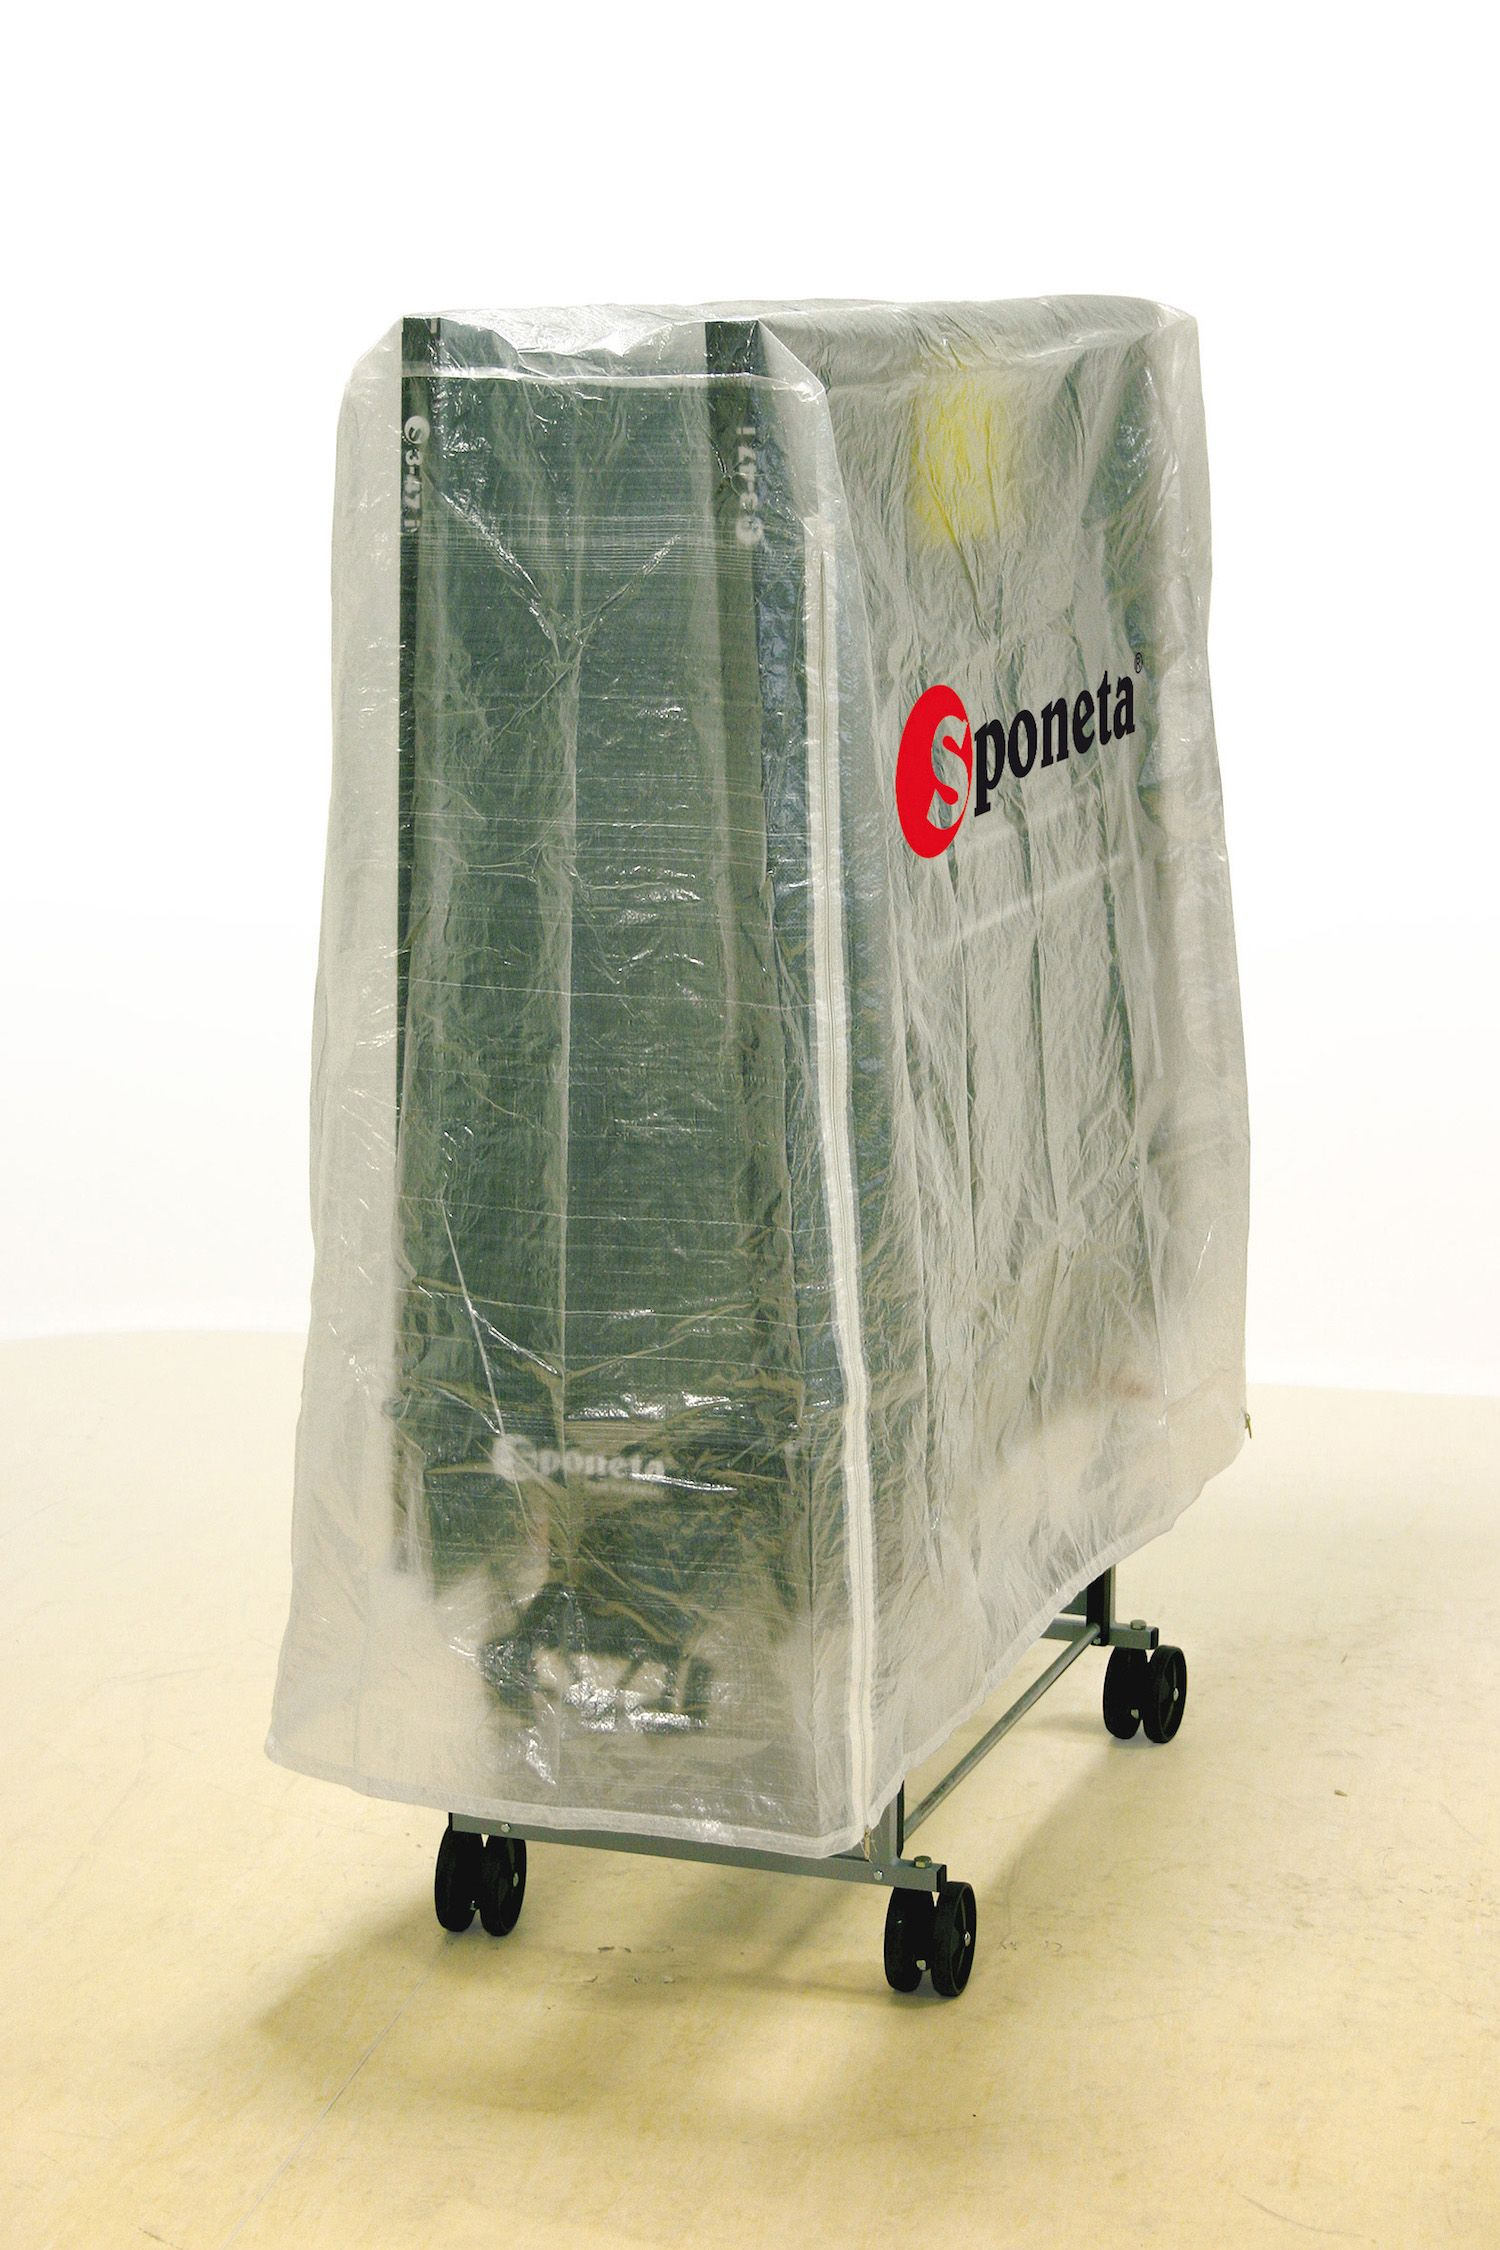 TC0274: Tafeltennistafel Sponeta Outdoor Expertline Compact Plus Grijs  #4